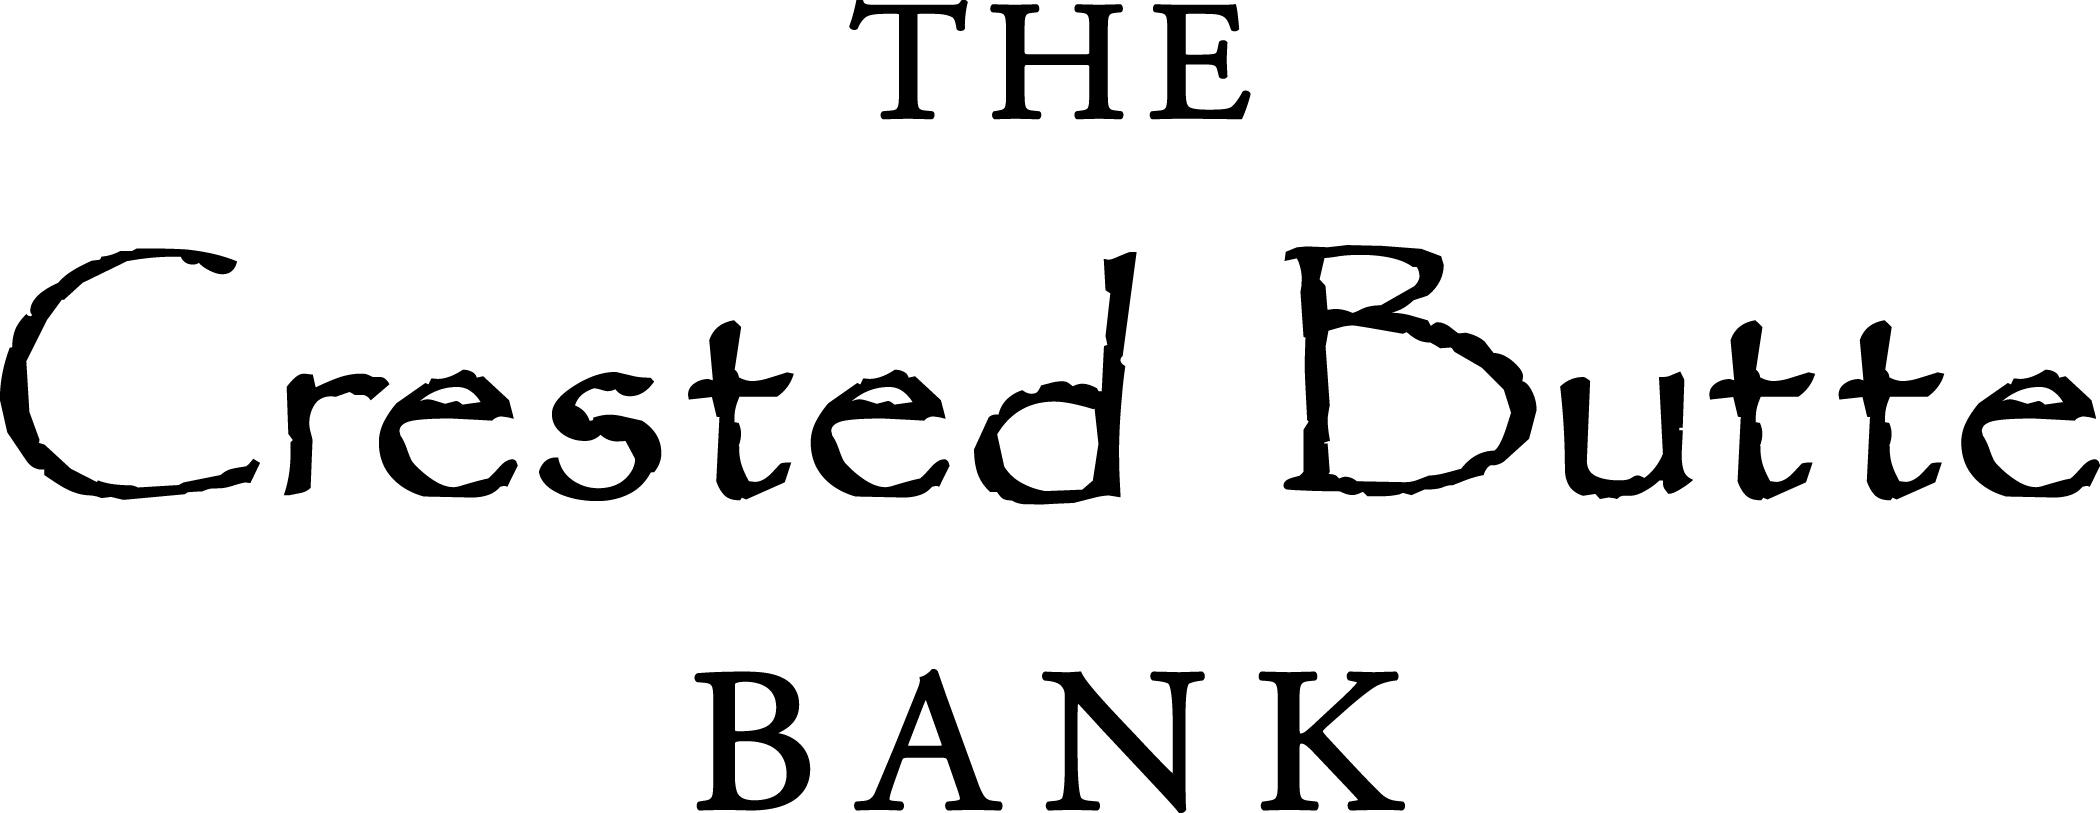 CB Bank.jpg